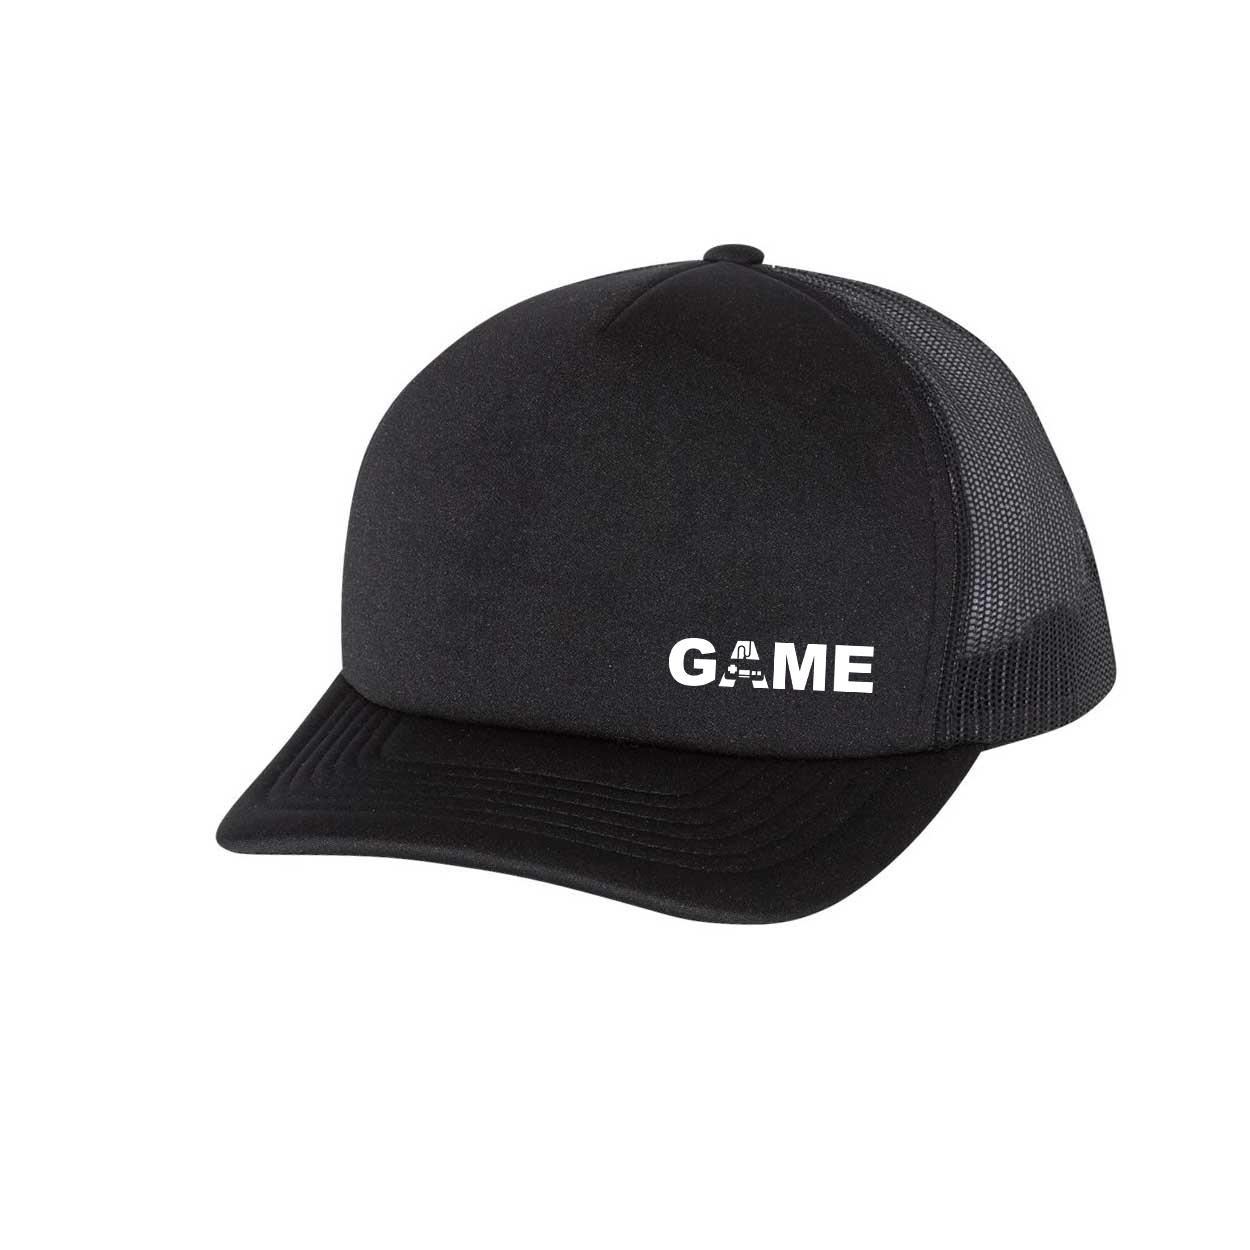 Game Controller Logo Night Out Premium Foam Trucker Snapback Hat Black (White Logo)